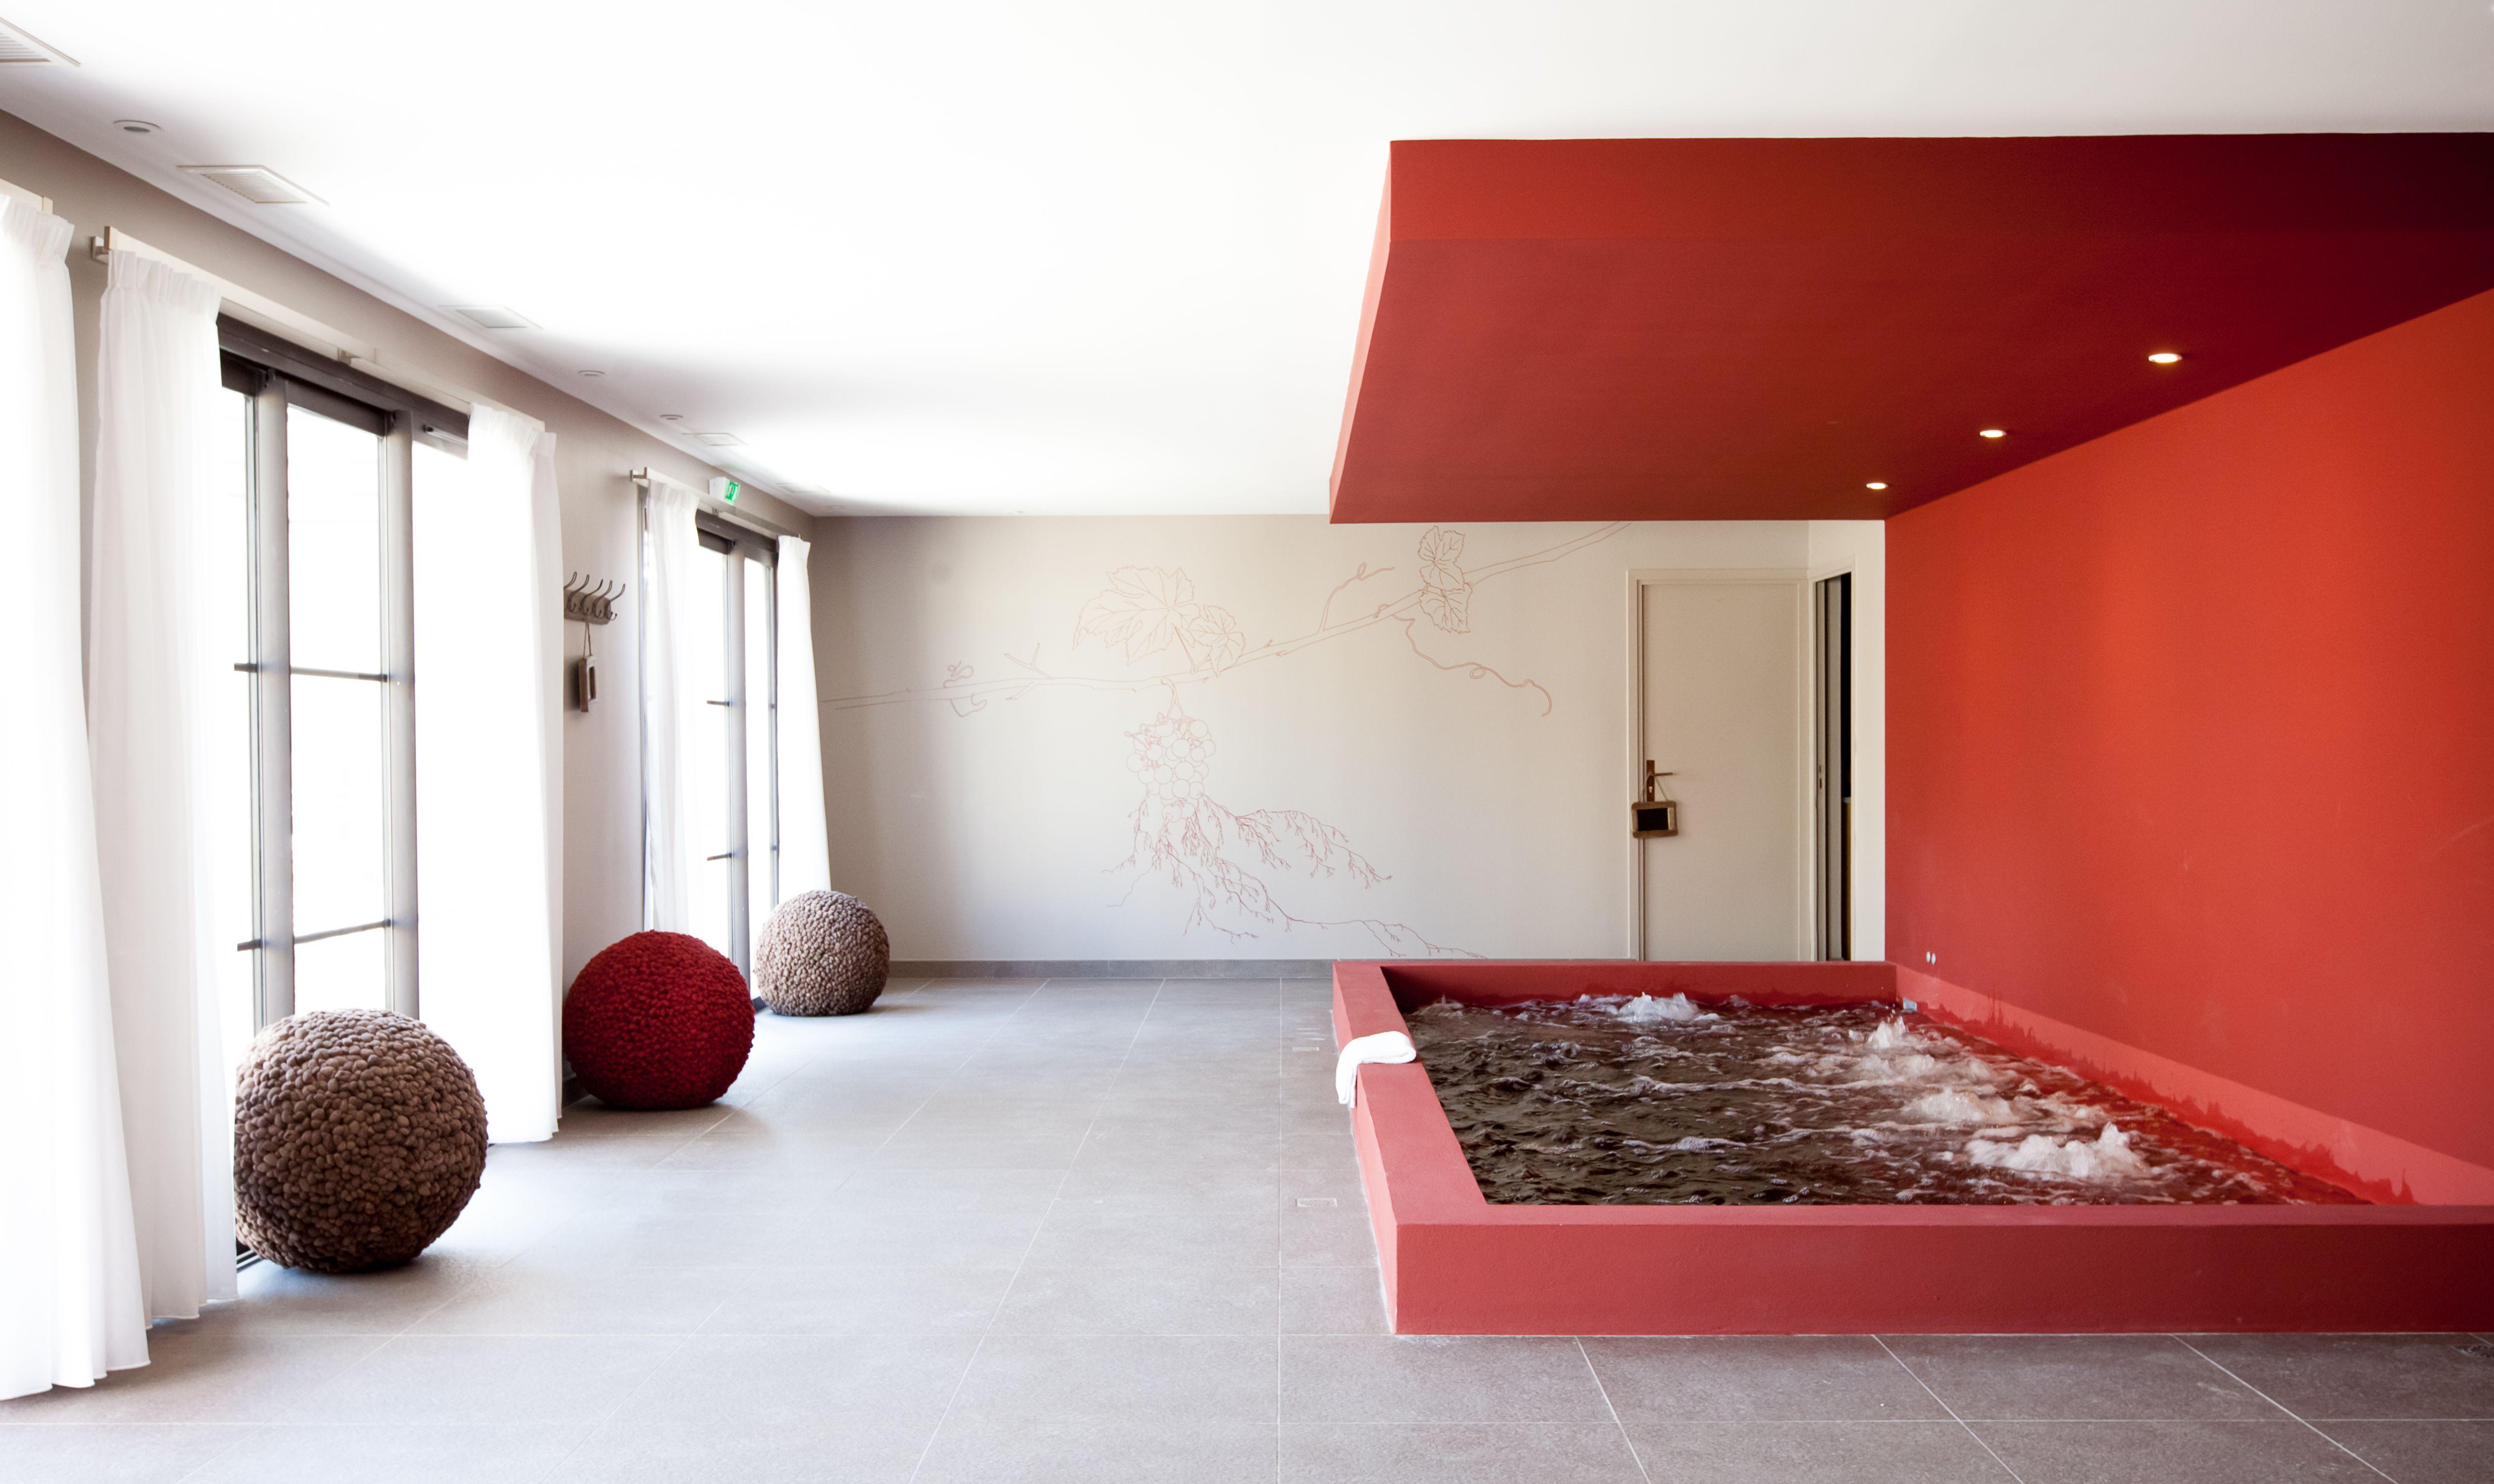 Espace d tente piscine spa copie s boudot distillerie de p zenas p zenas en 2019 - Pezenas piscine ...